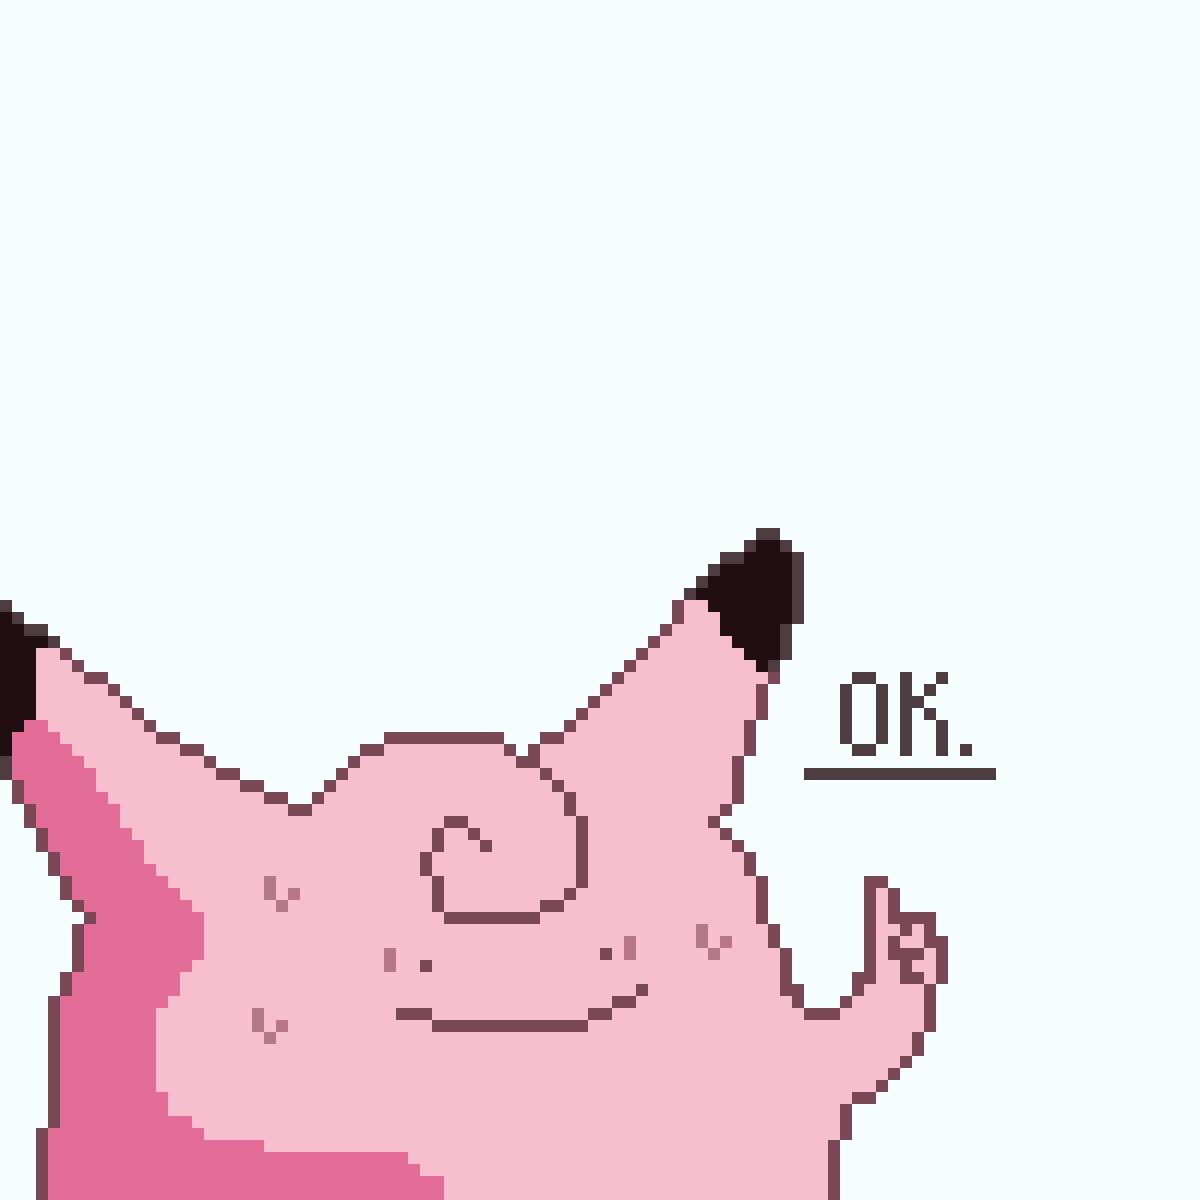 OK by PixelBird